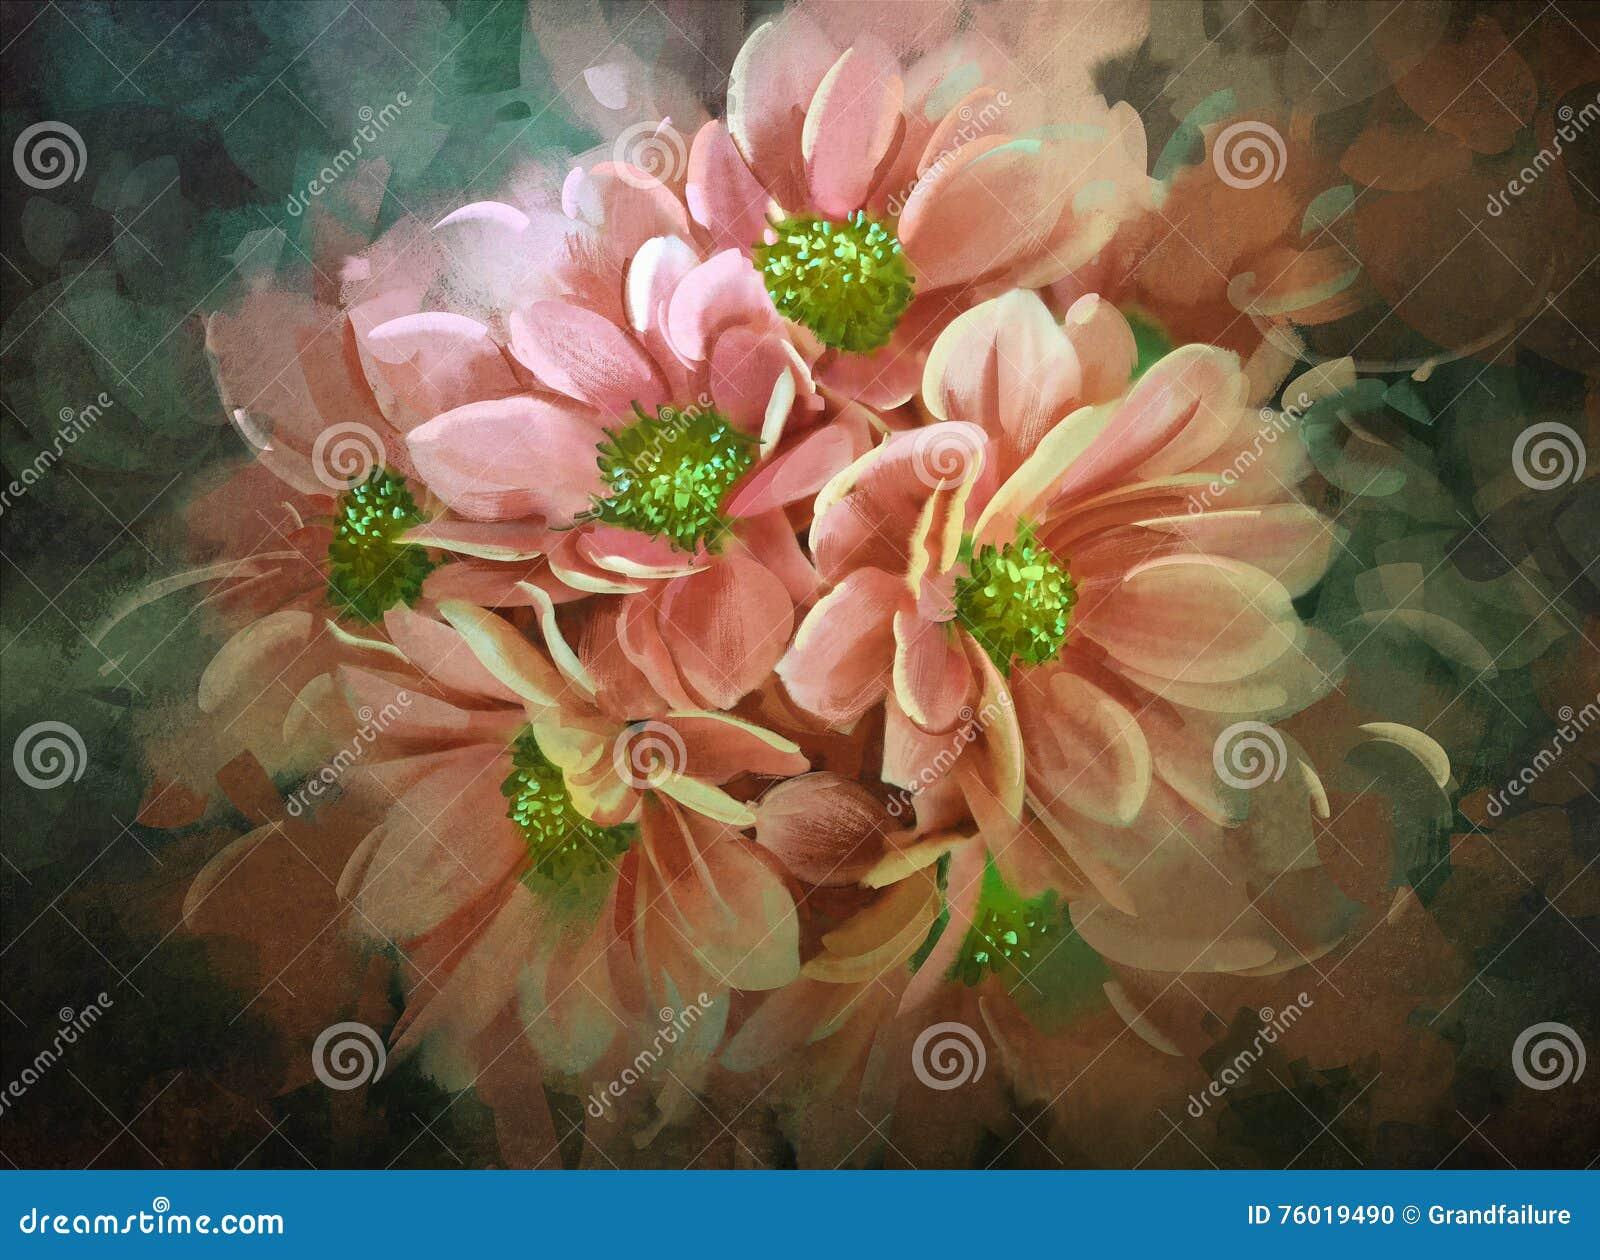 Beautiful flowerscolor bloomingillustration stock illustration beautiful flowerscolor bloomingillustration izmirmasajfo